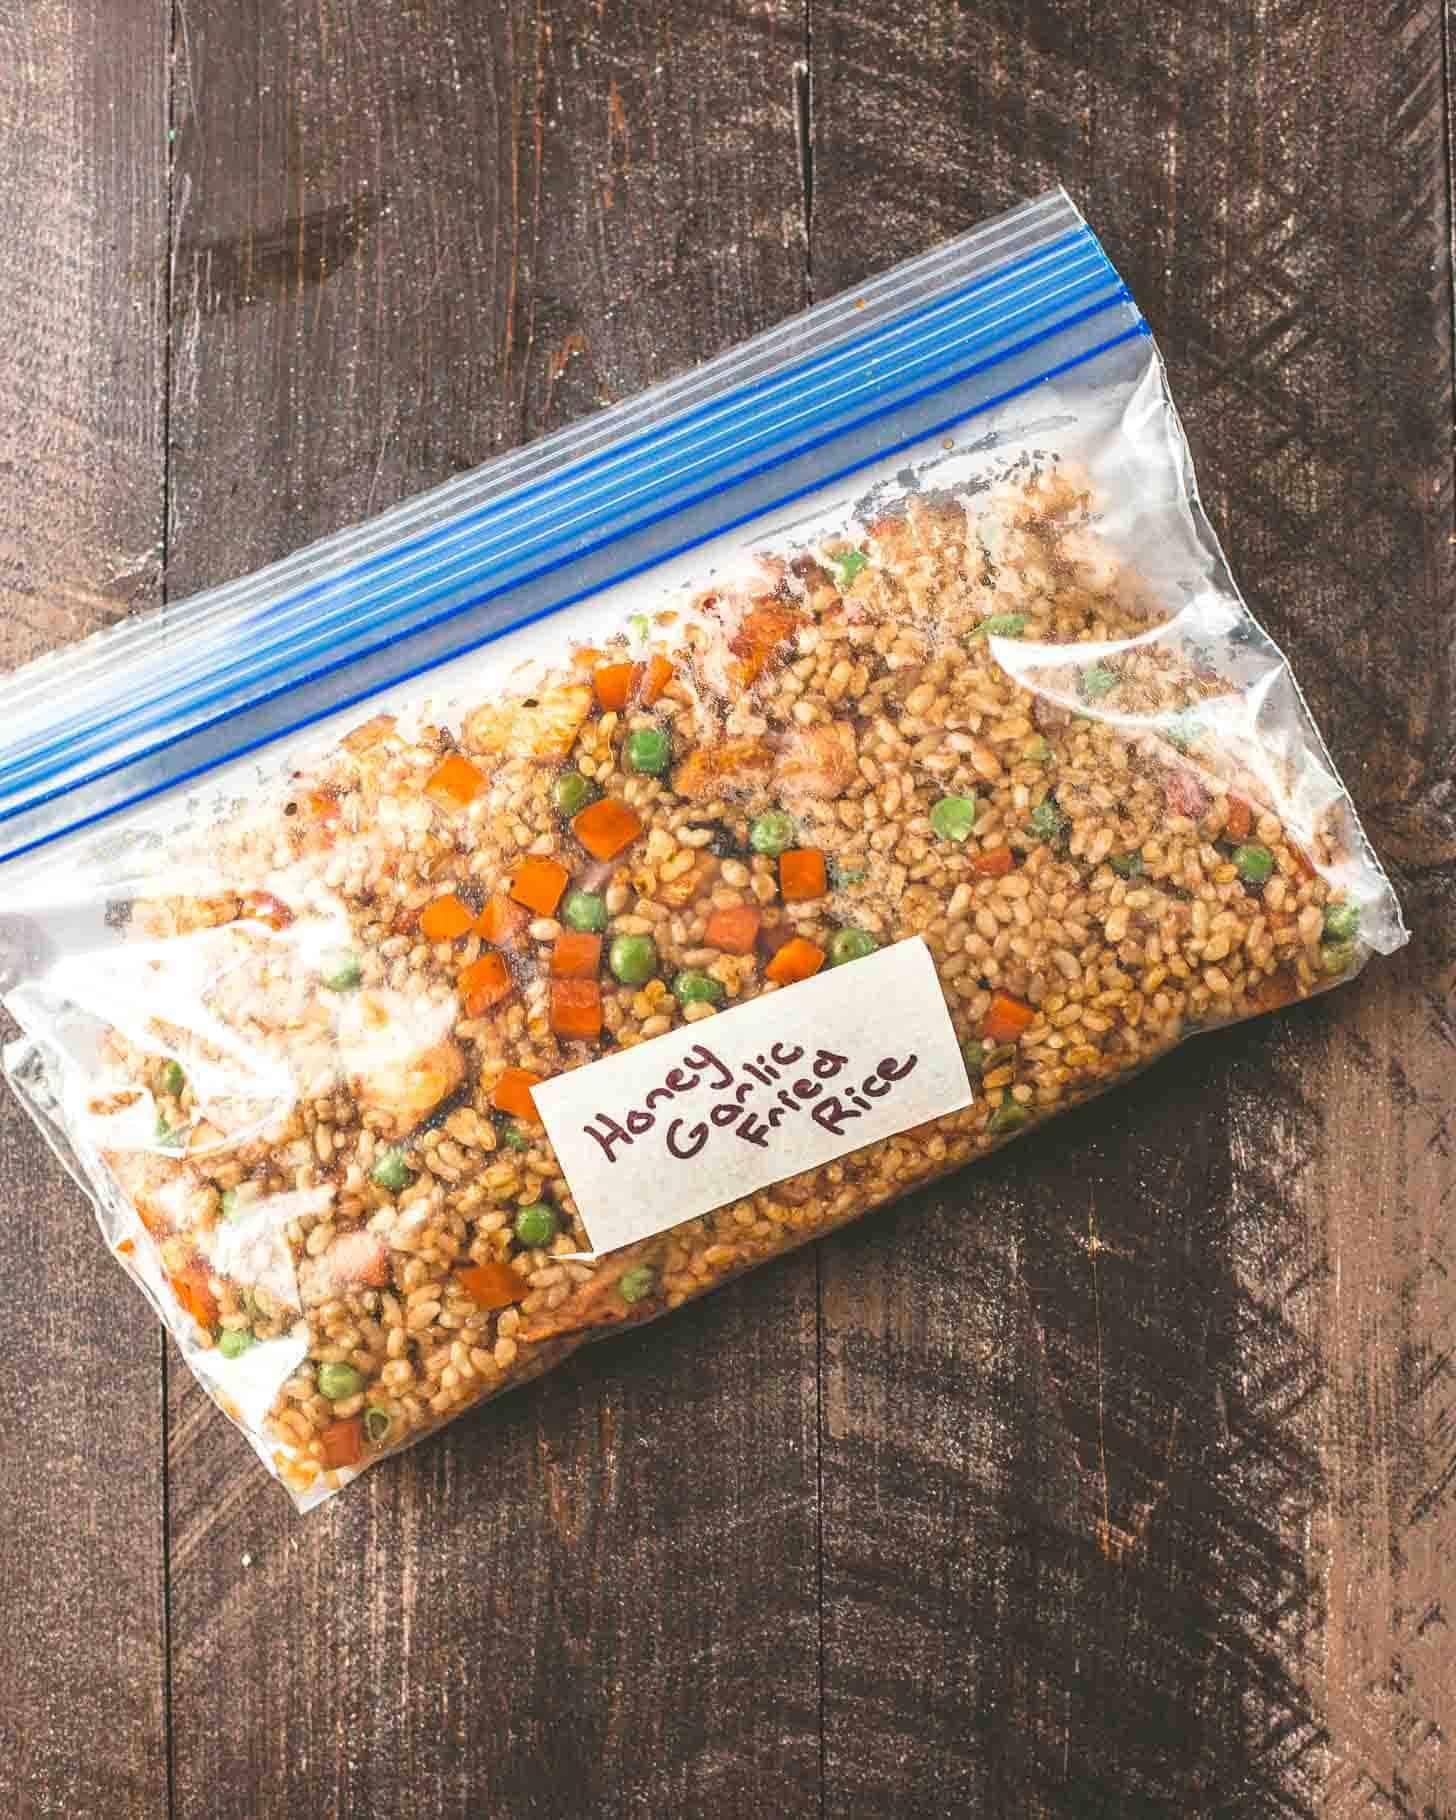 Honey Garlic Chicken Fried Rice in a freezer bag